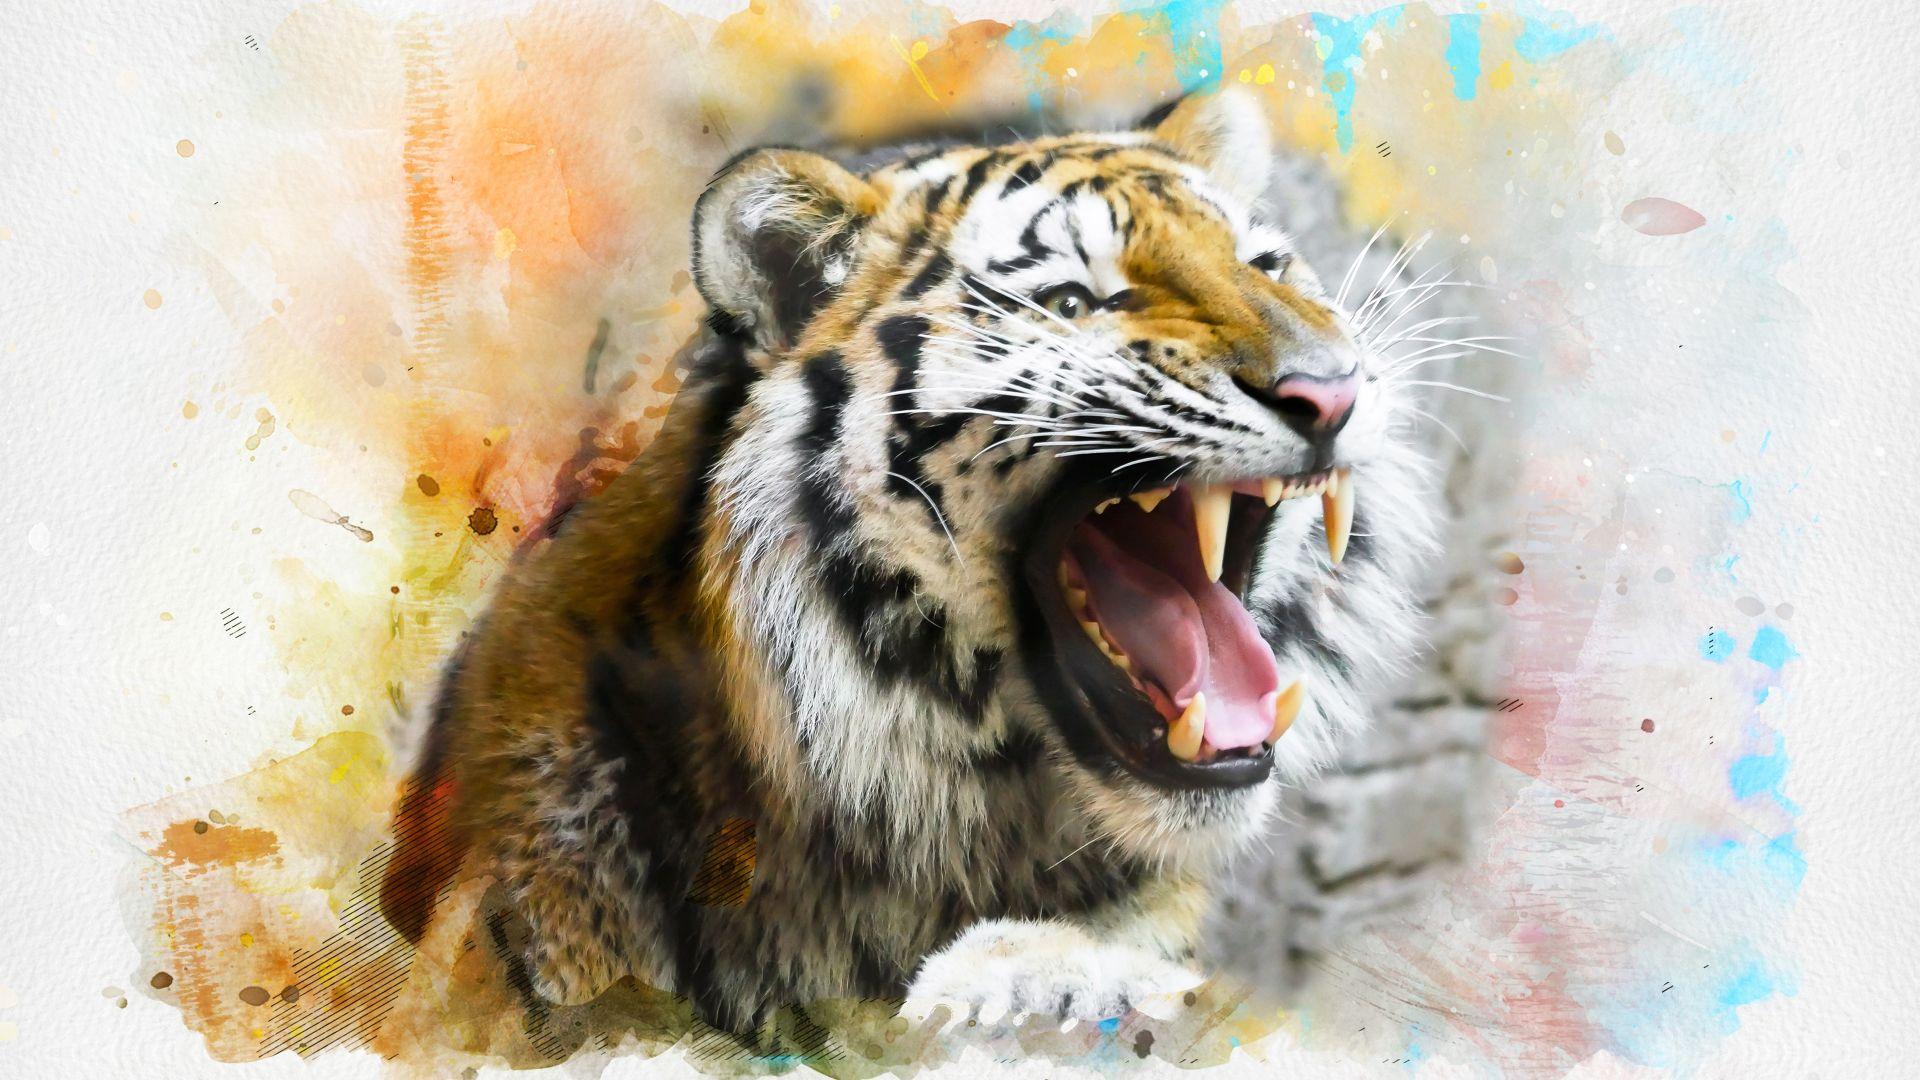 Tiger Art, Pic